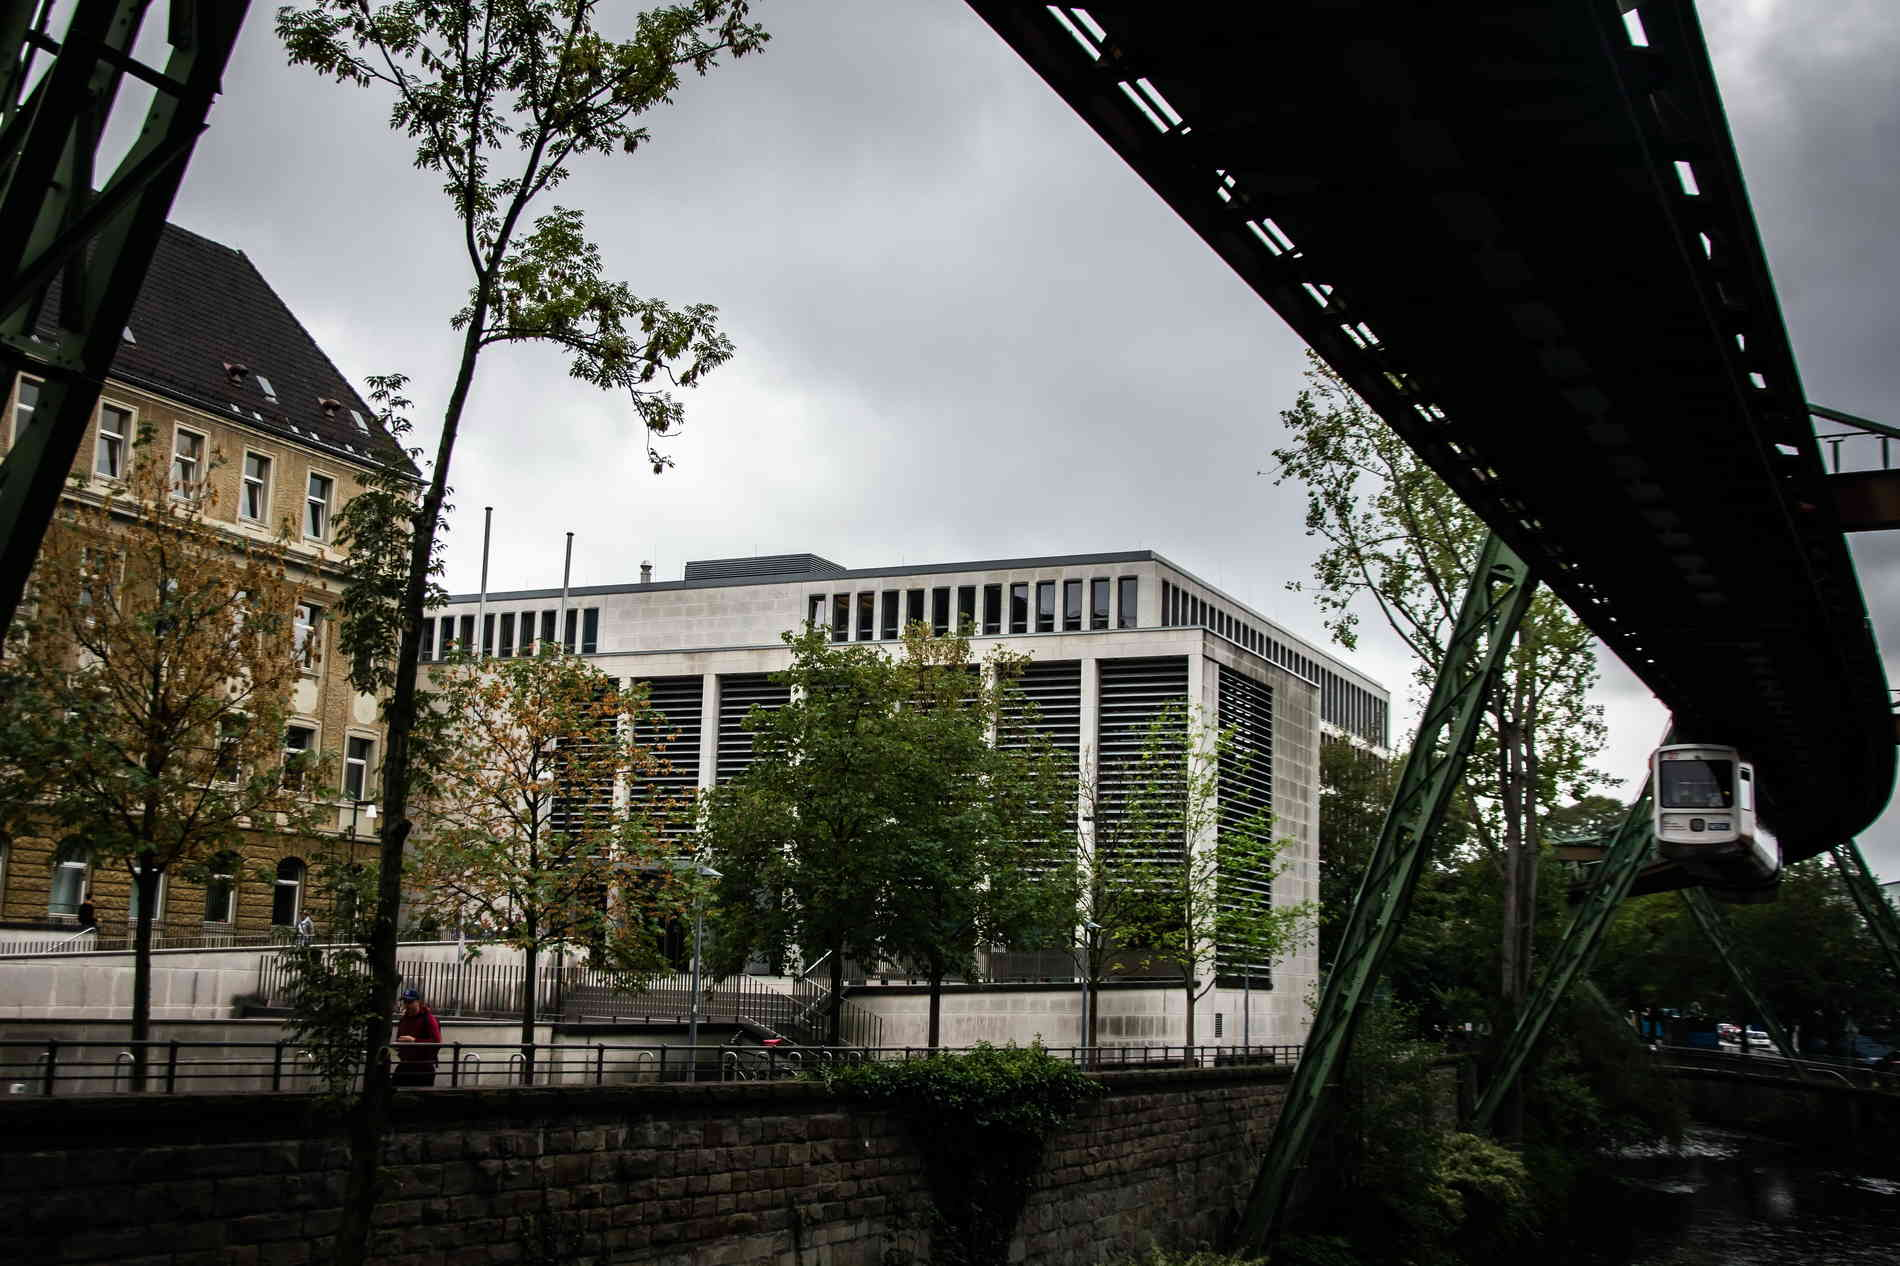 Wuppertal Vergewaltigung